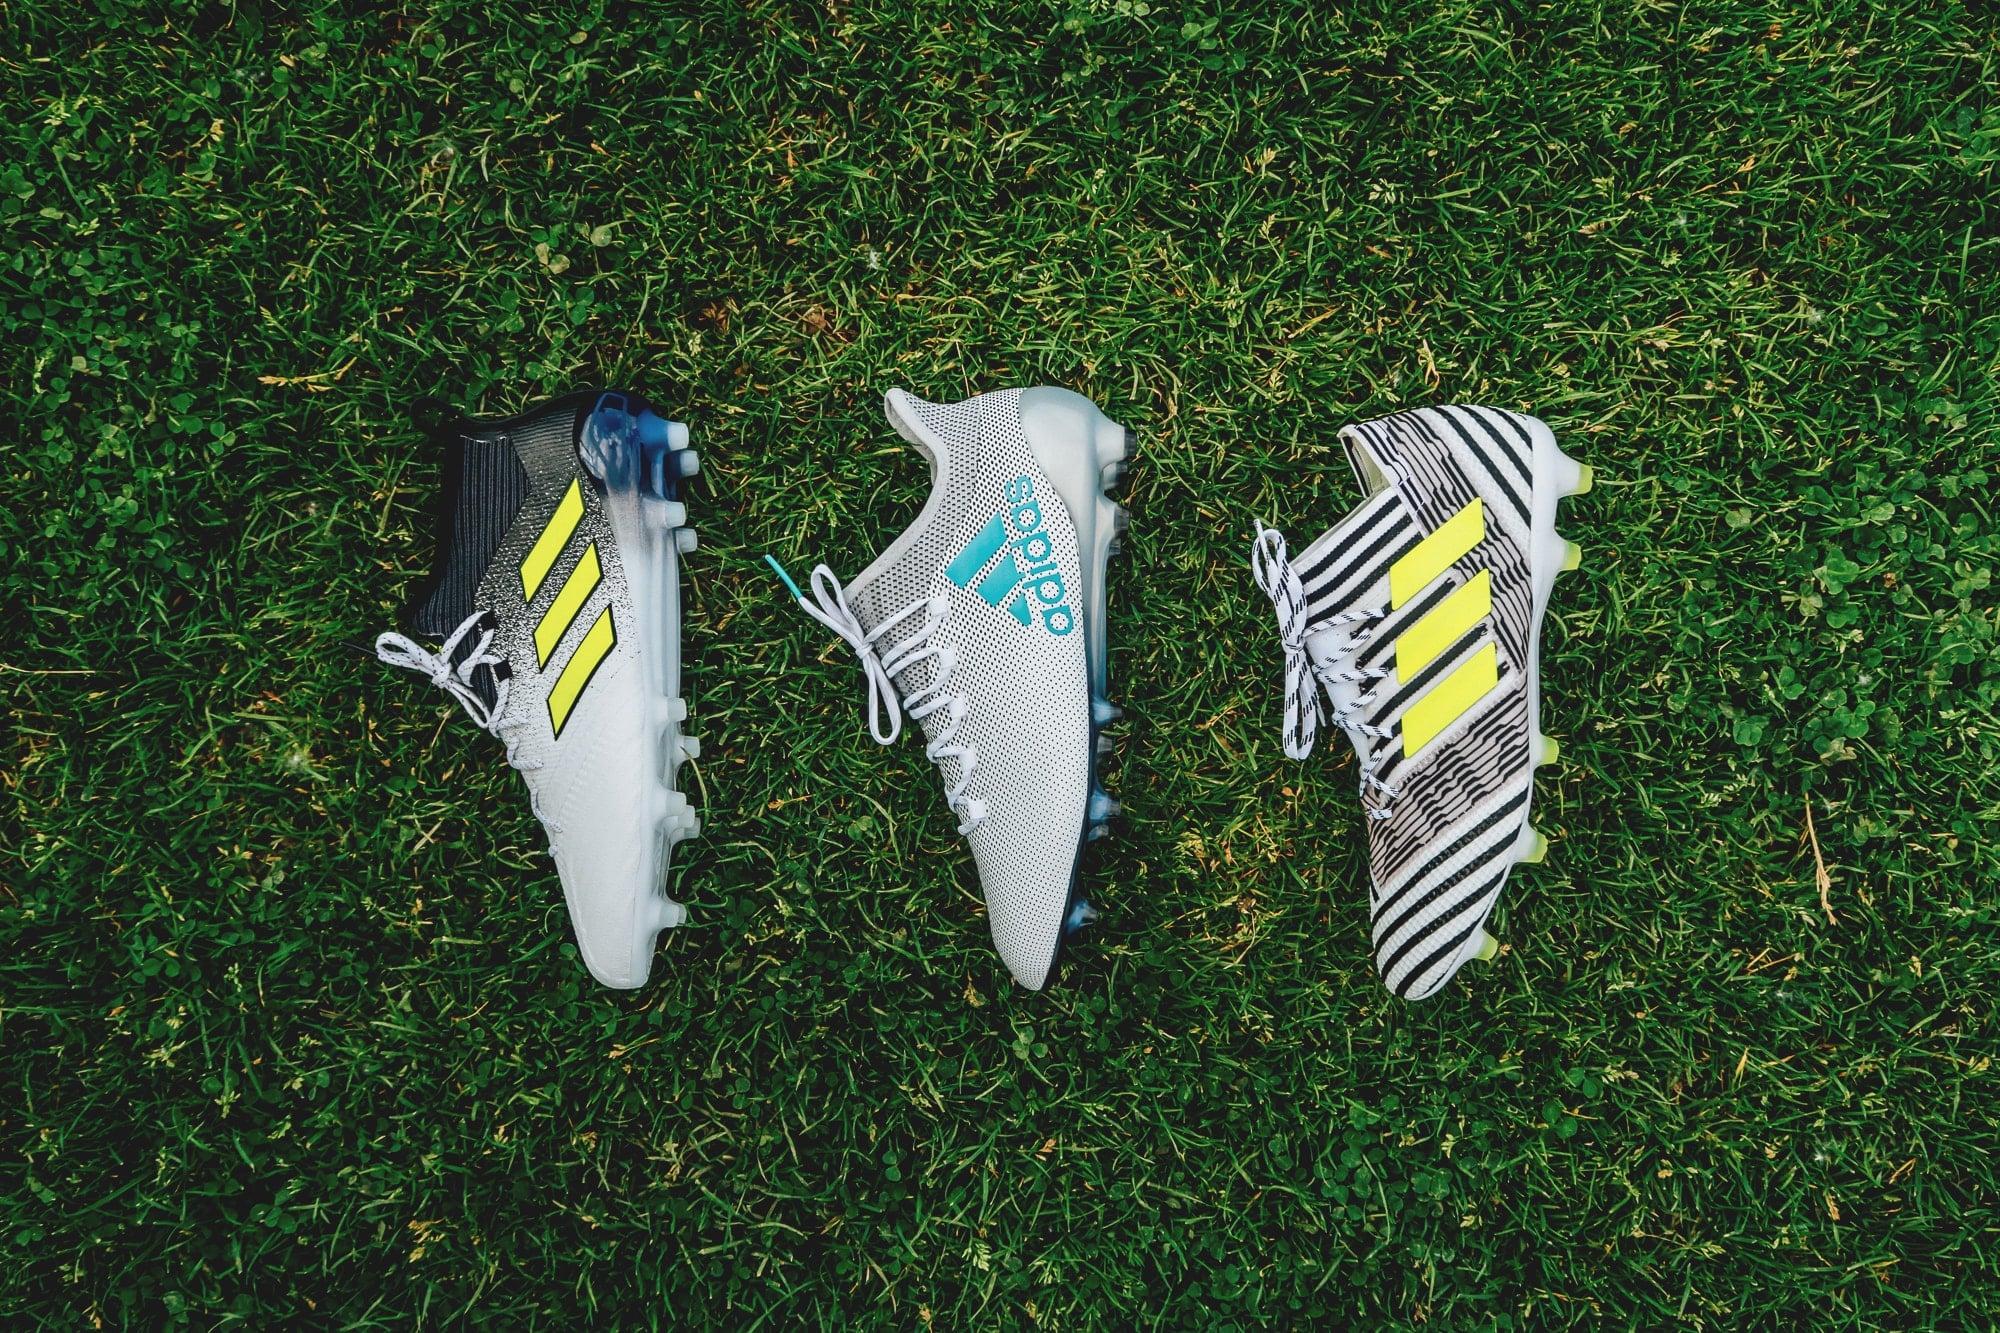 chaussure-football-adidas-pack-dust-storm-mai-2017-2-minchaussure-football-adidas-pack-dust-storm-mai-2017-2-min